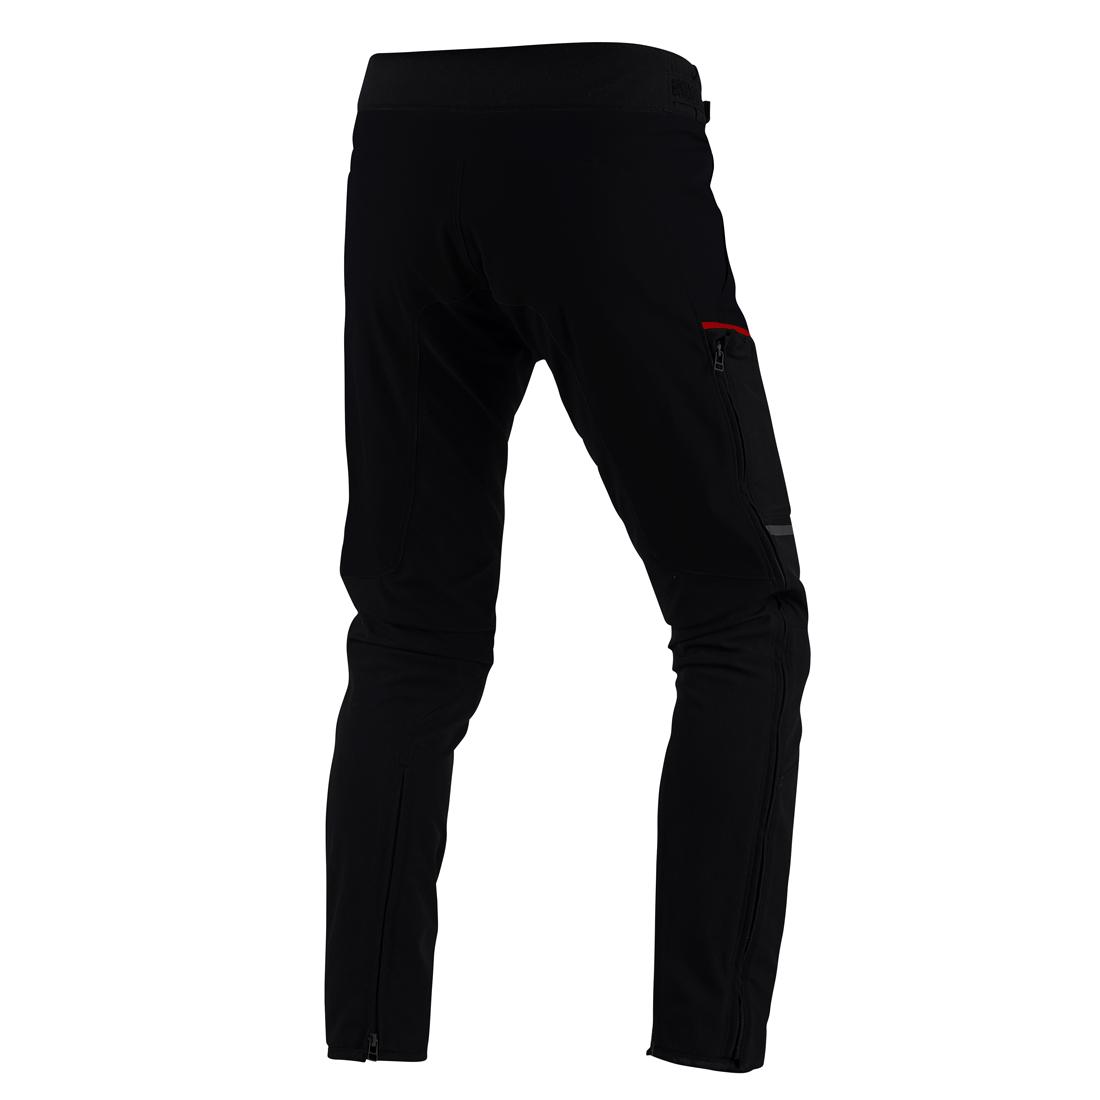 【DAINESE】P.RAINSUN 車褲 - 「Webike-摩托百貨」